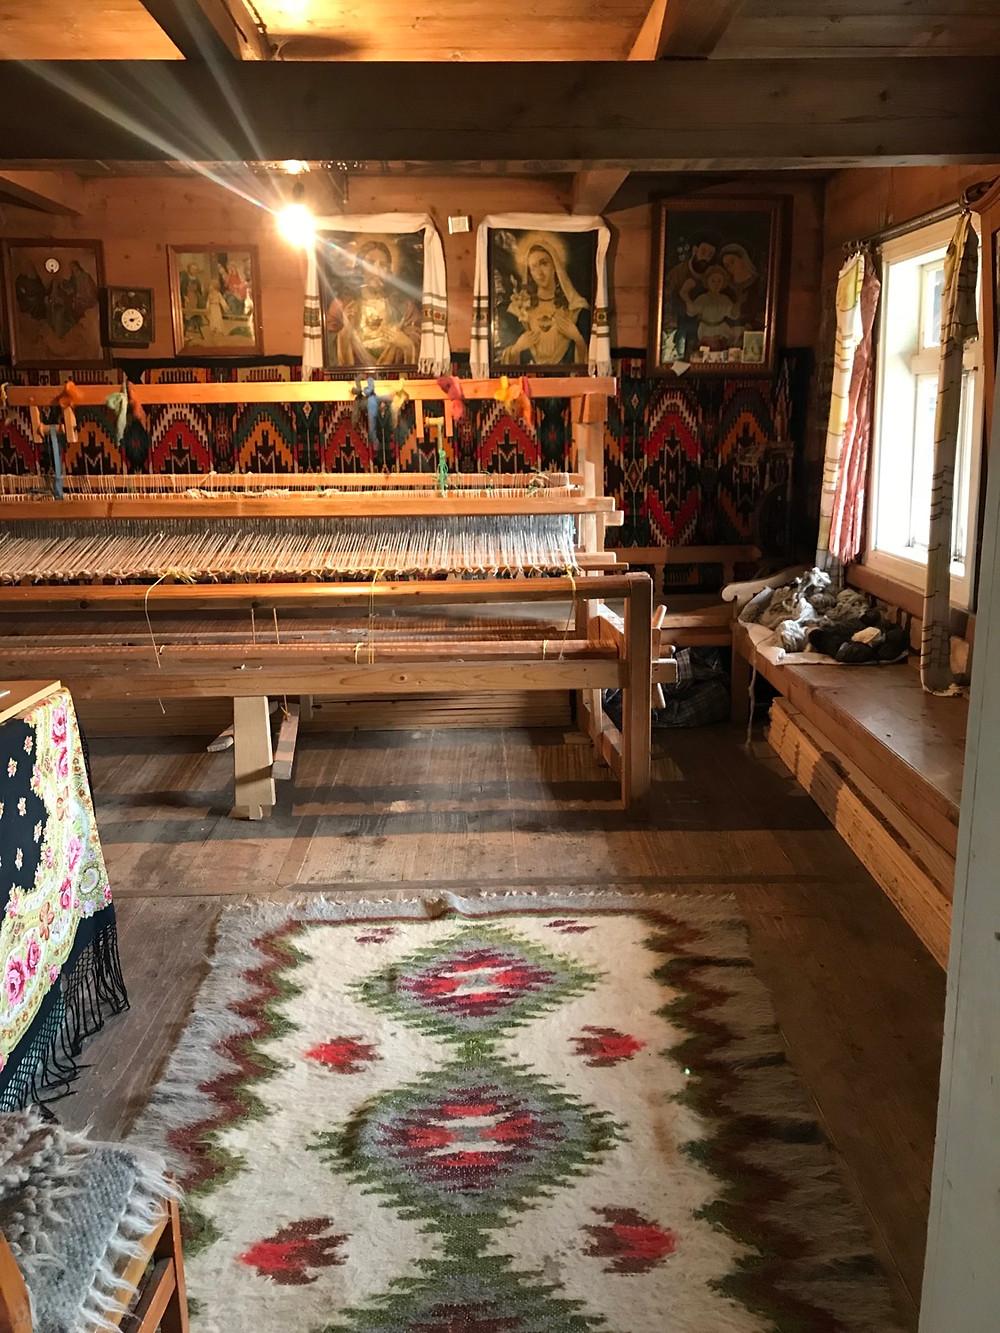 Traditional loom inside the traditional khata-grazhda house.